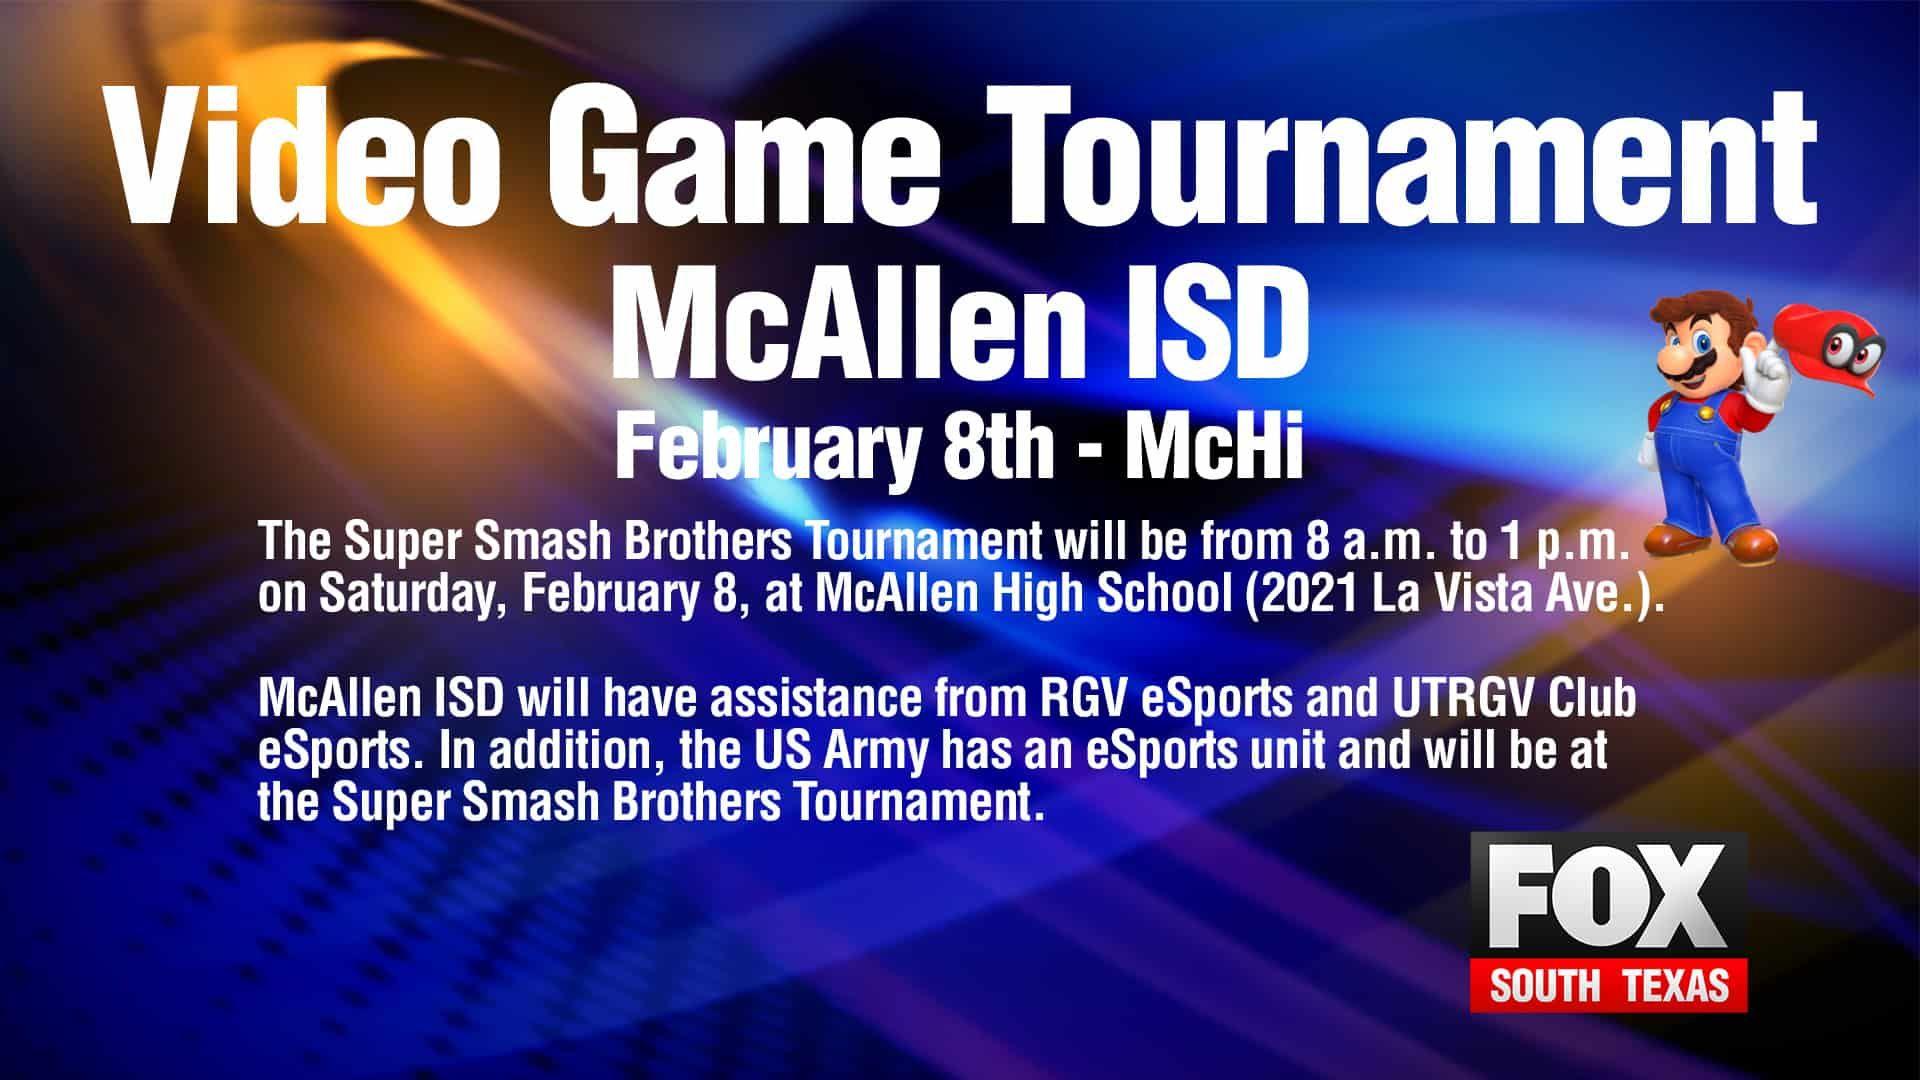 McAllen ISD Set To Host Videogame Tournament in 2020